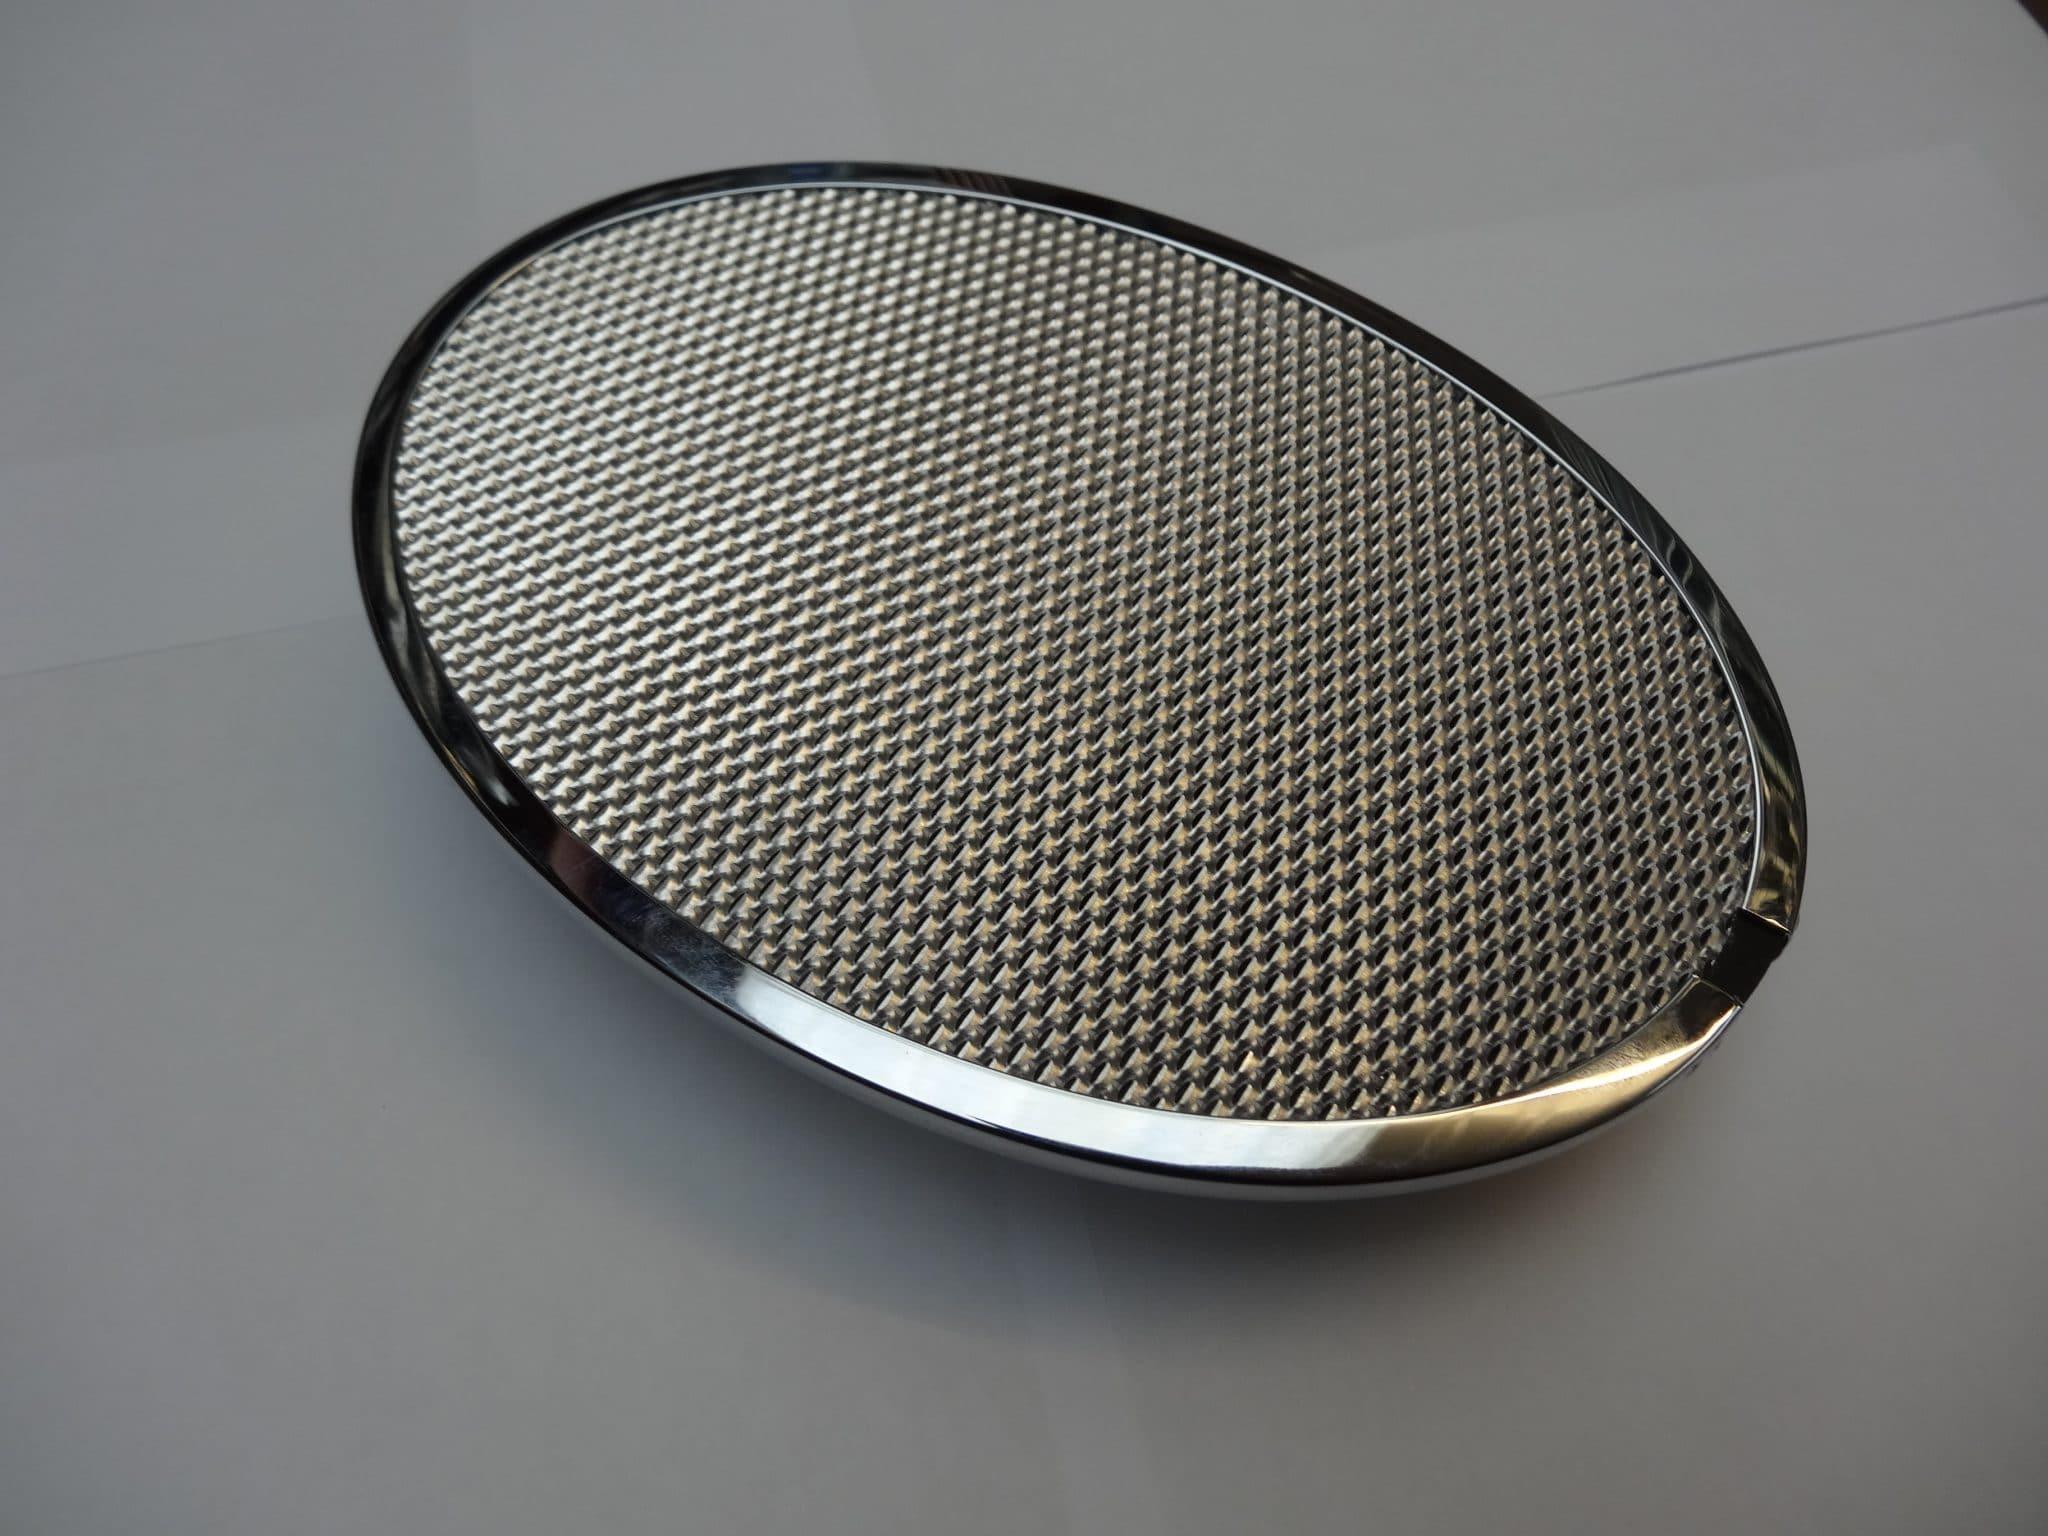 Speaker Amp Grill Set Oval 356abt5 For Porsche 356 C254